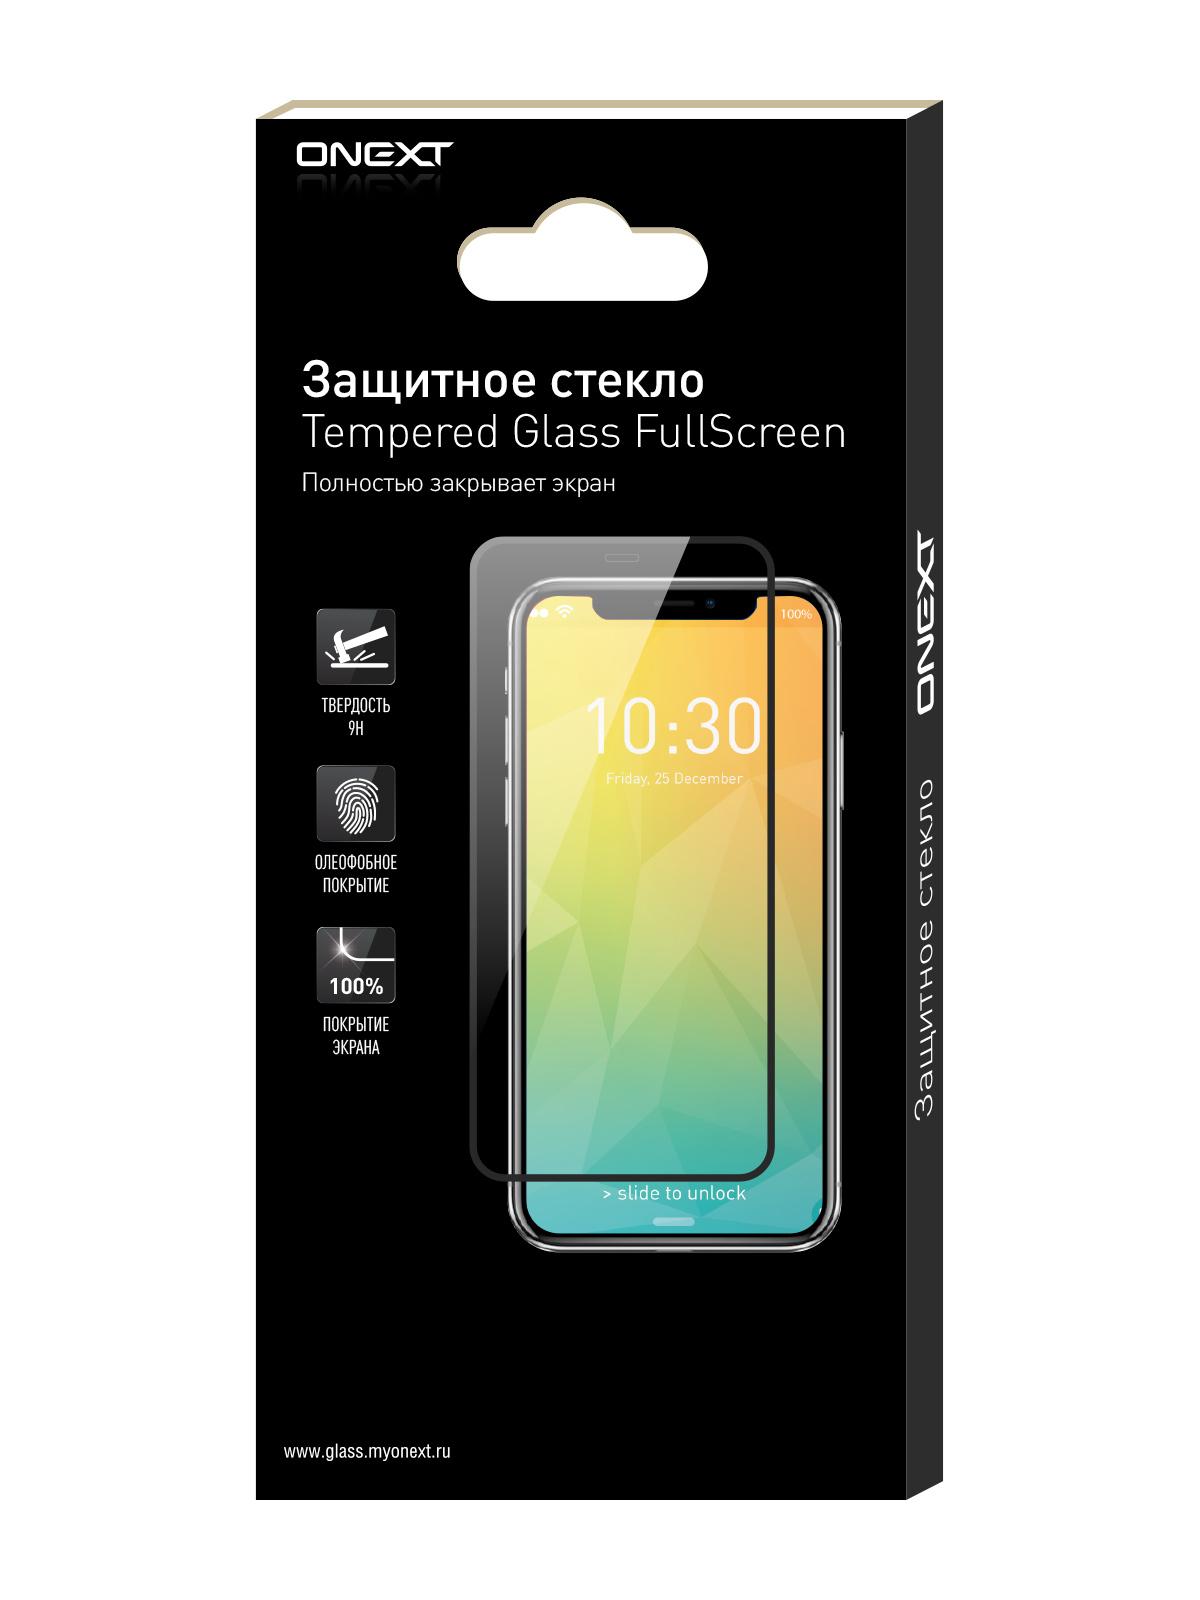 Защитное стекло ONEXT для Xiaomi Redmi Note 6 Pro (2018) Black